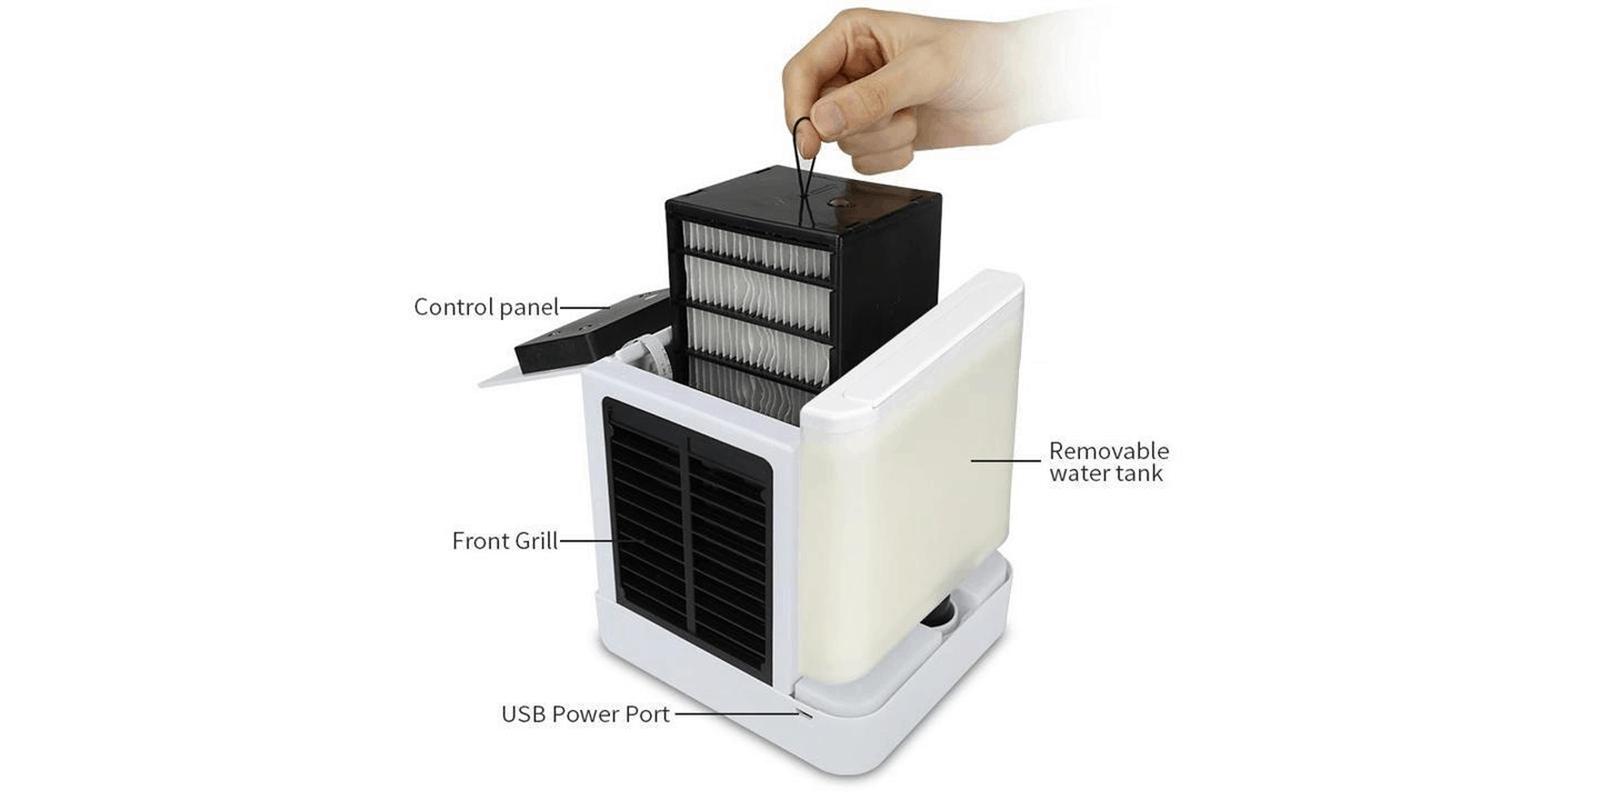 T10 Cooler Benefits